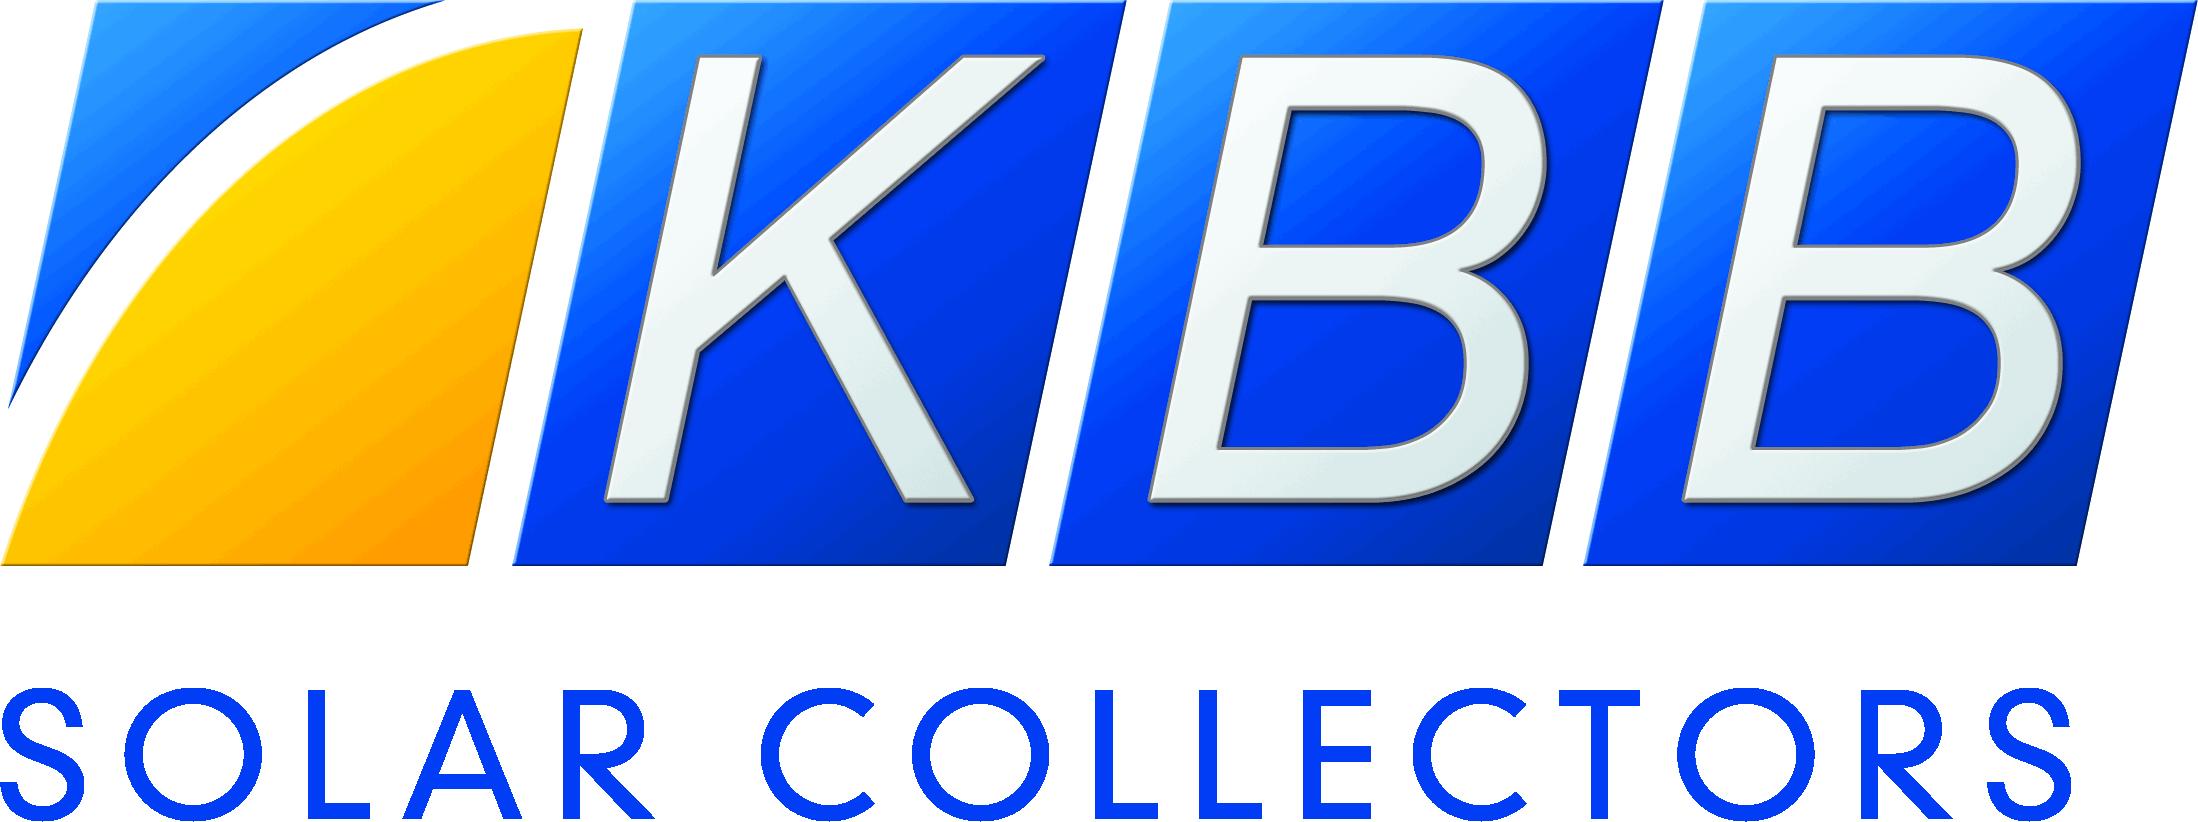 KBB Kollektorbau